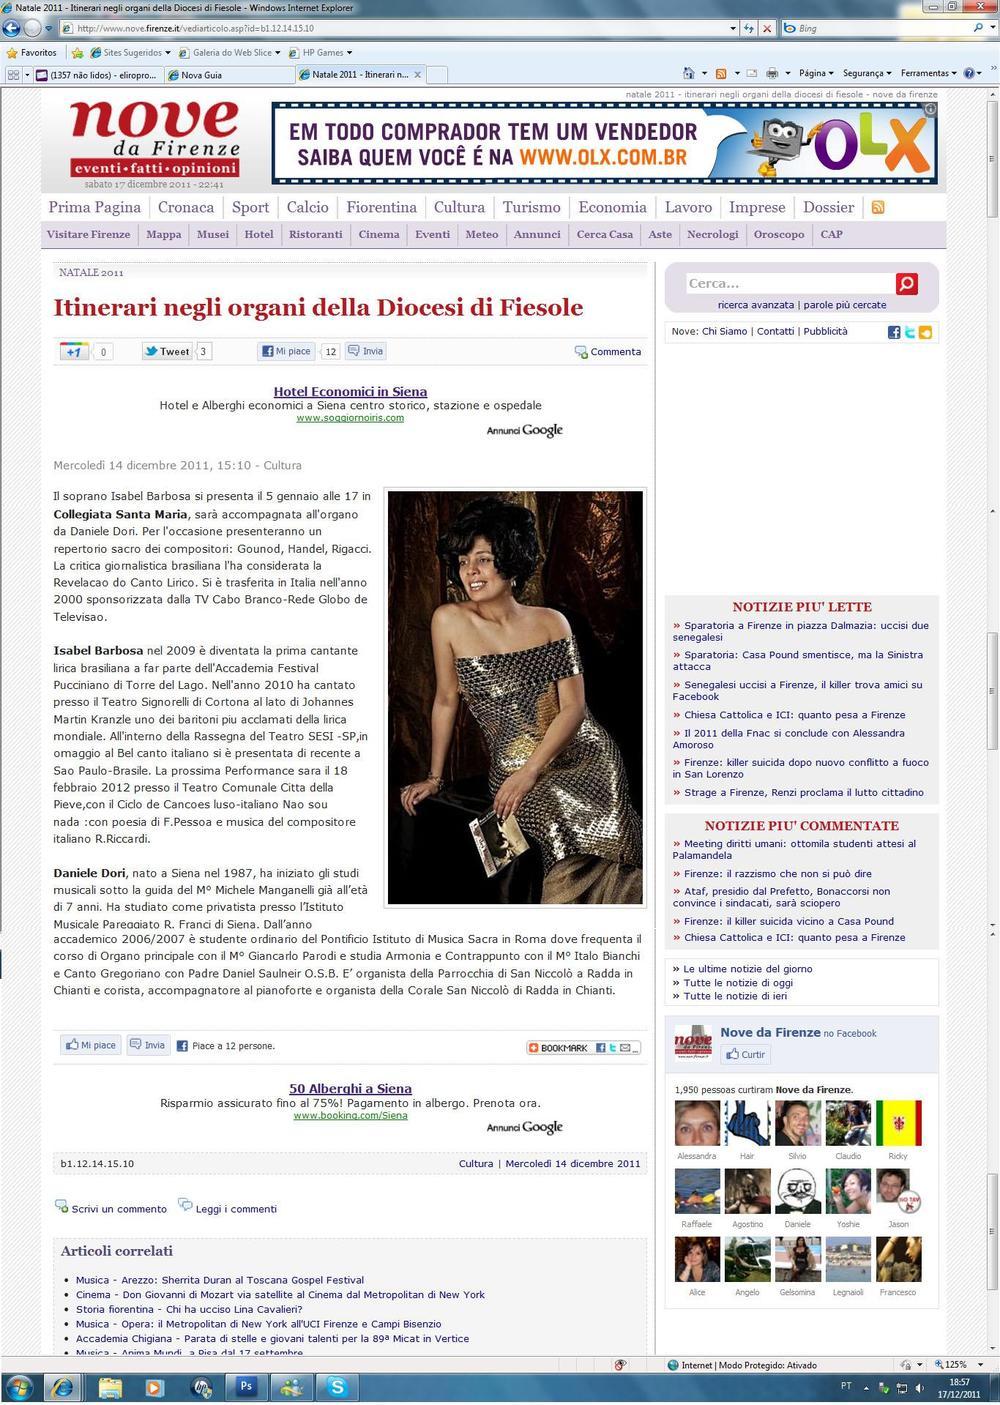 nove_da_firenze_natal_de_2011.jpg